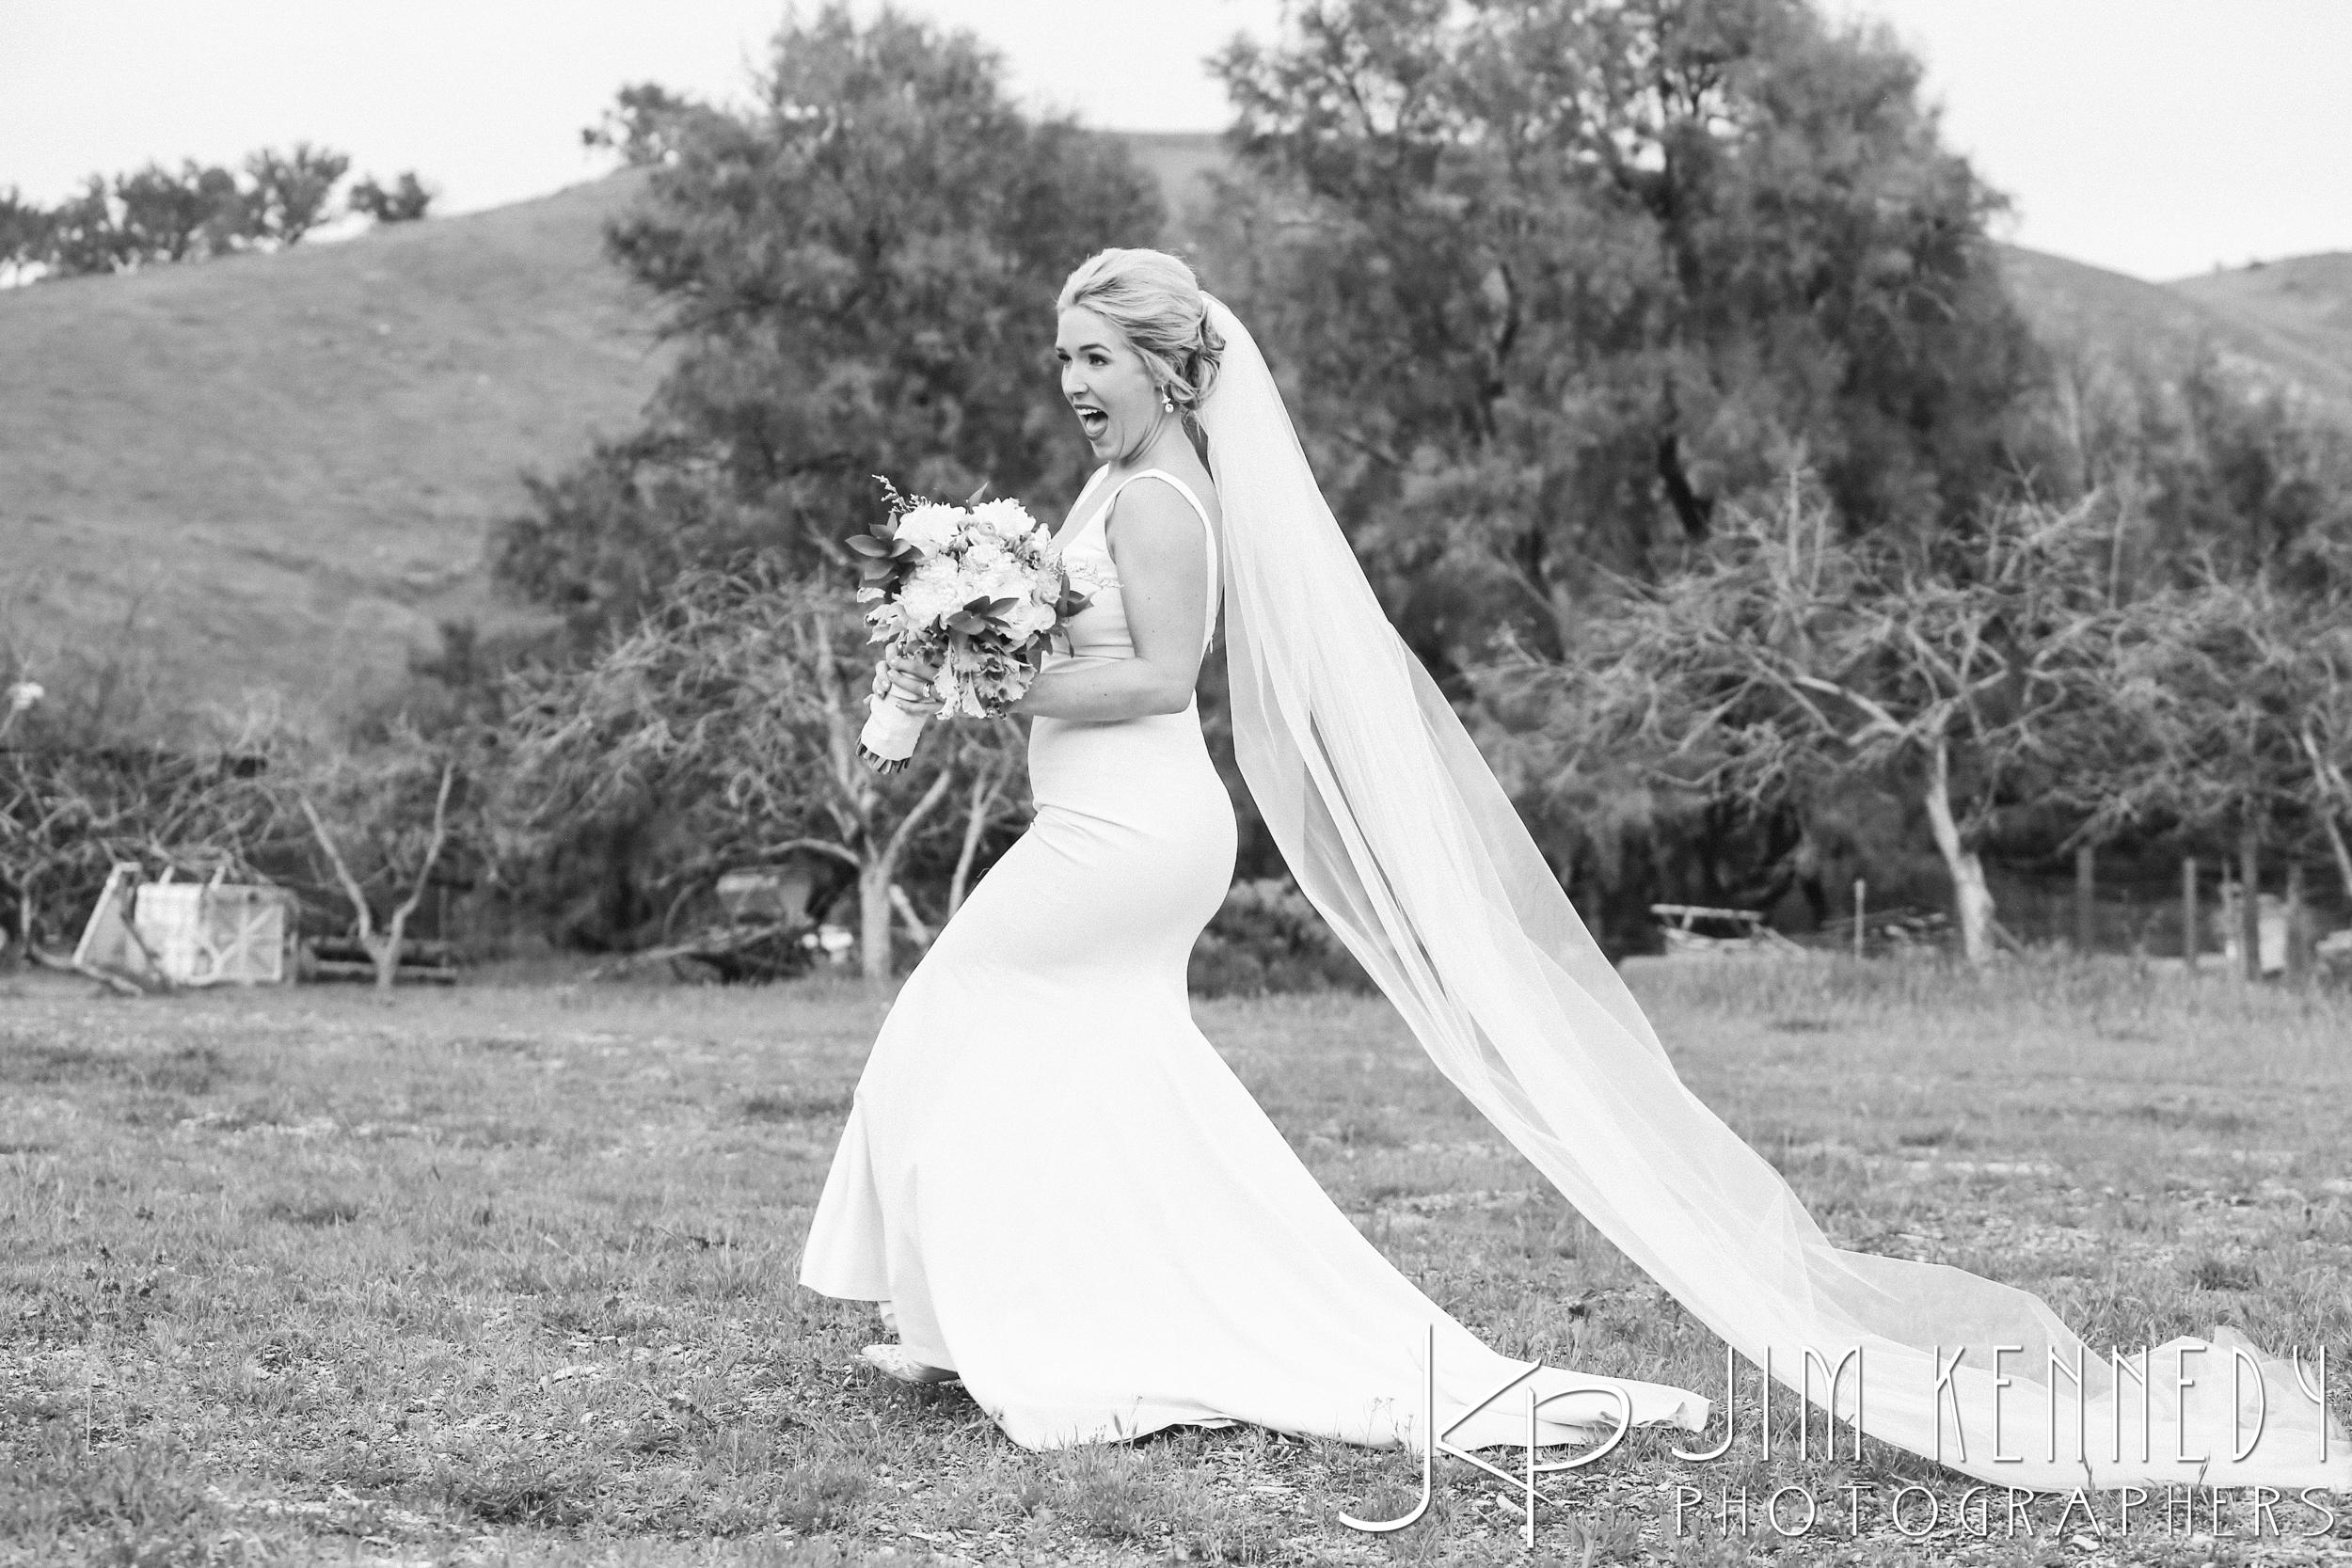 jim_kennedy_photographers_highland_springs_wedding_caitlyn_0137.jpg